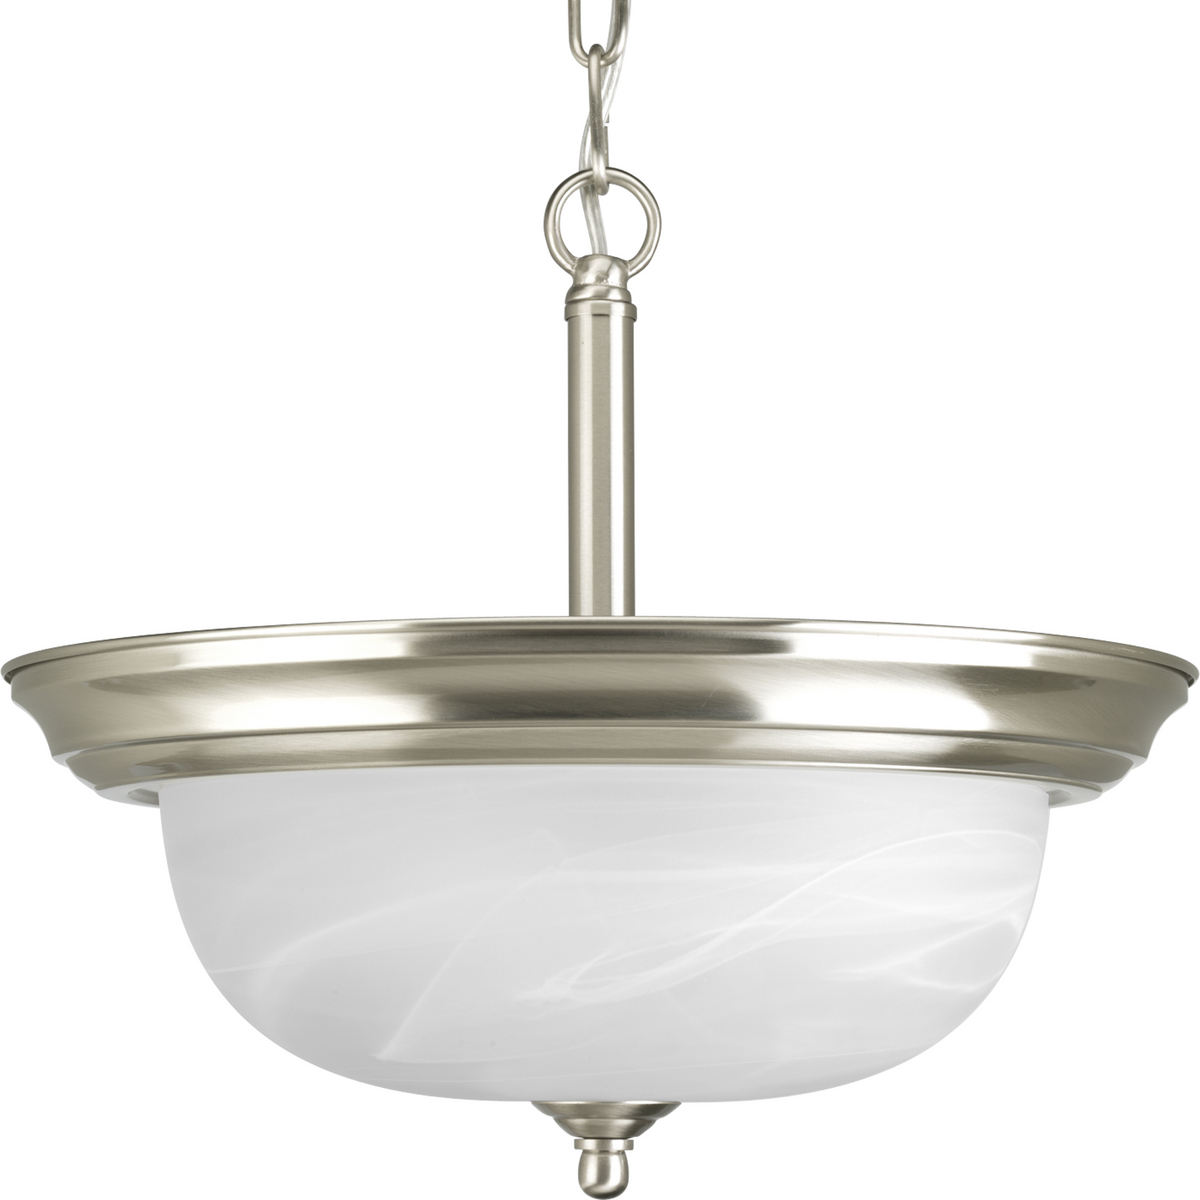 PRO P3927-09 2X100M Brushed Nickel Alabaster Glass Pendant